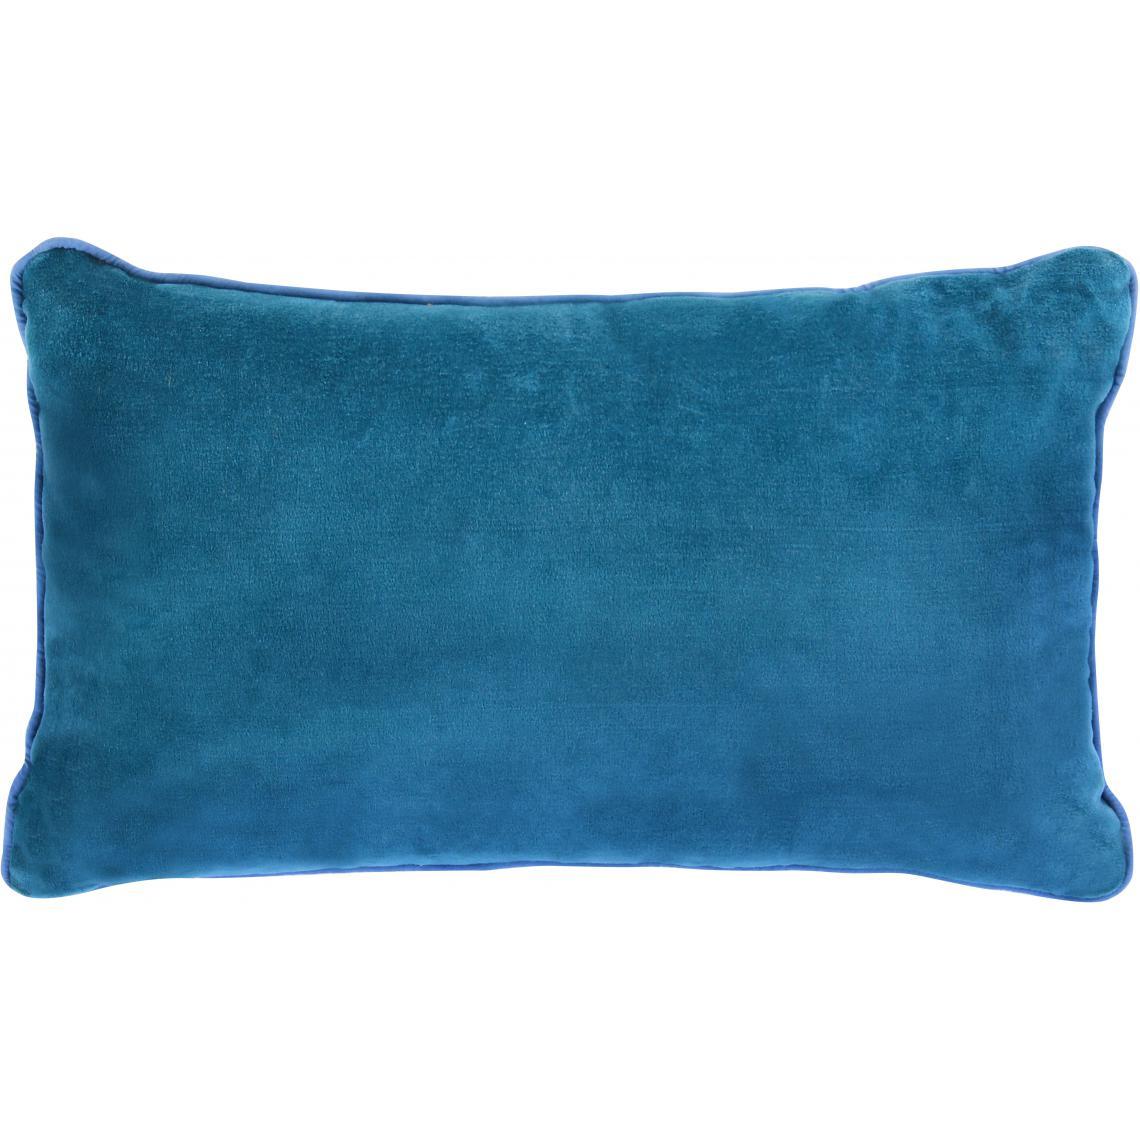 Coussin Rectangulaire en Velours Bleu Canard